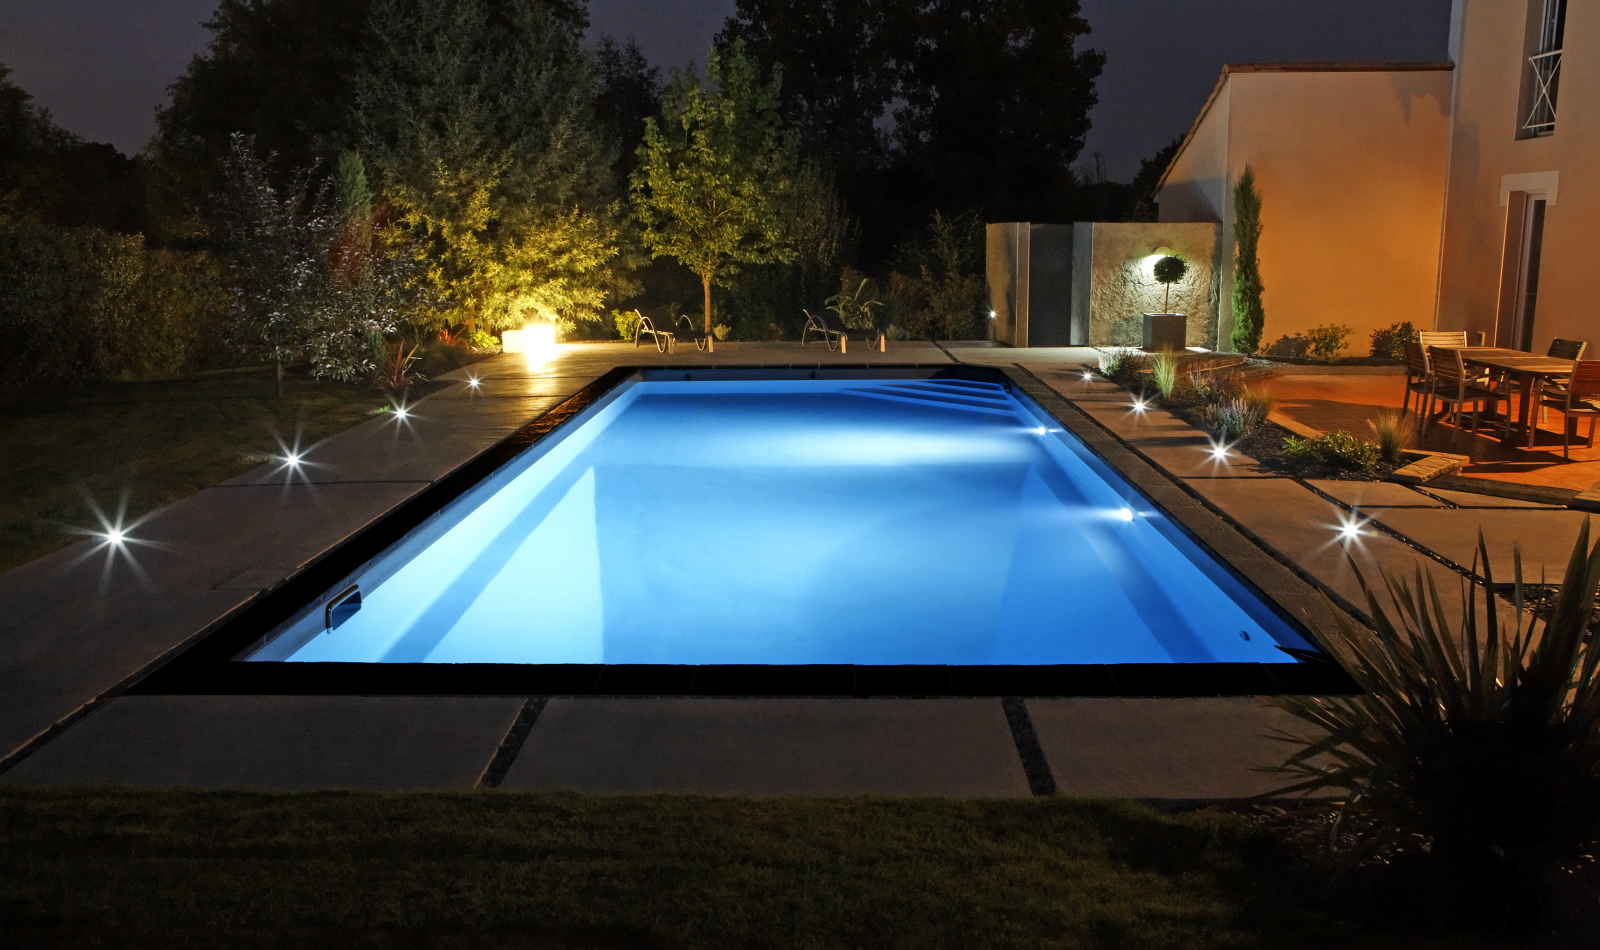 eclairage piscine reglementation